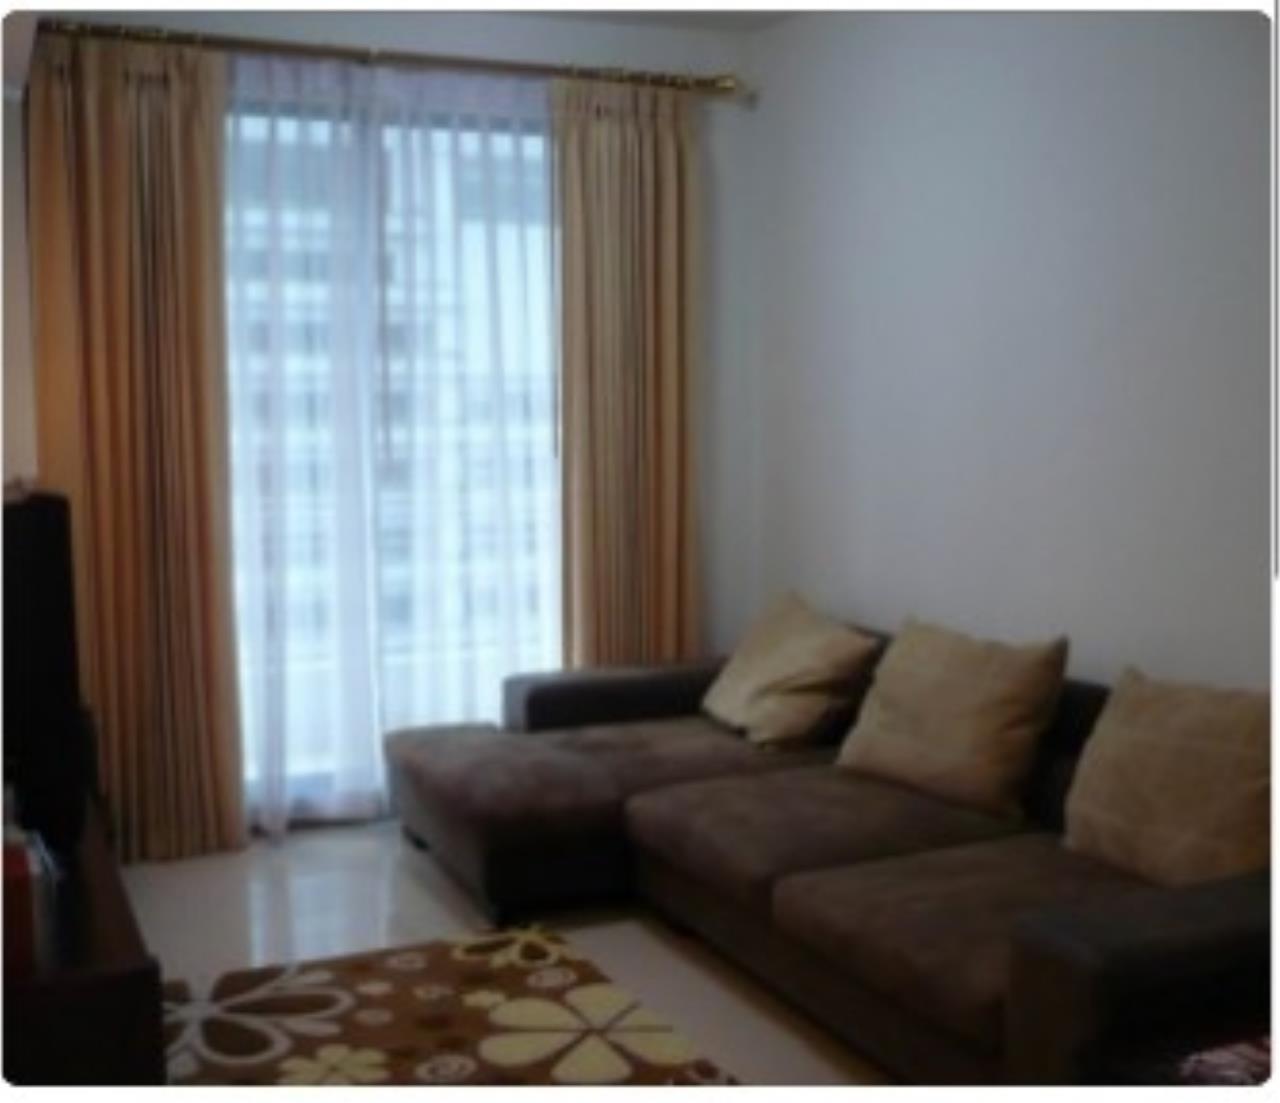 Agent - Mayteekul Sujirapinyokul Agency's AC2180418 For Rent Condo Supalai Premier Place Asoke Condo MRT Phetchaburi 7